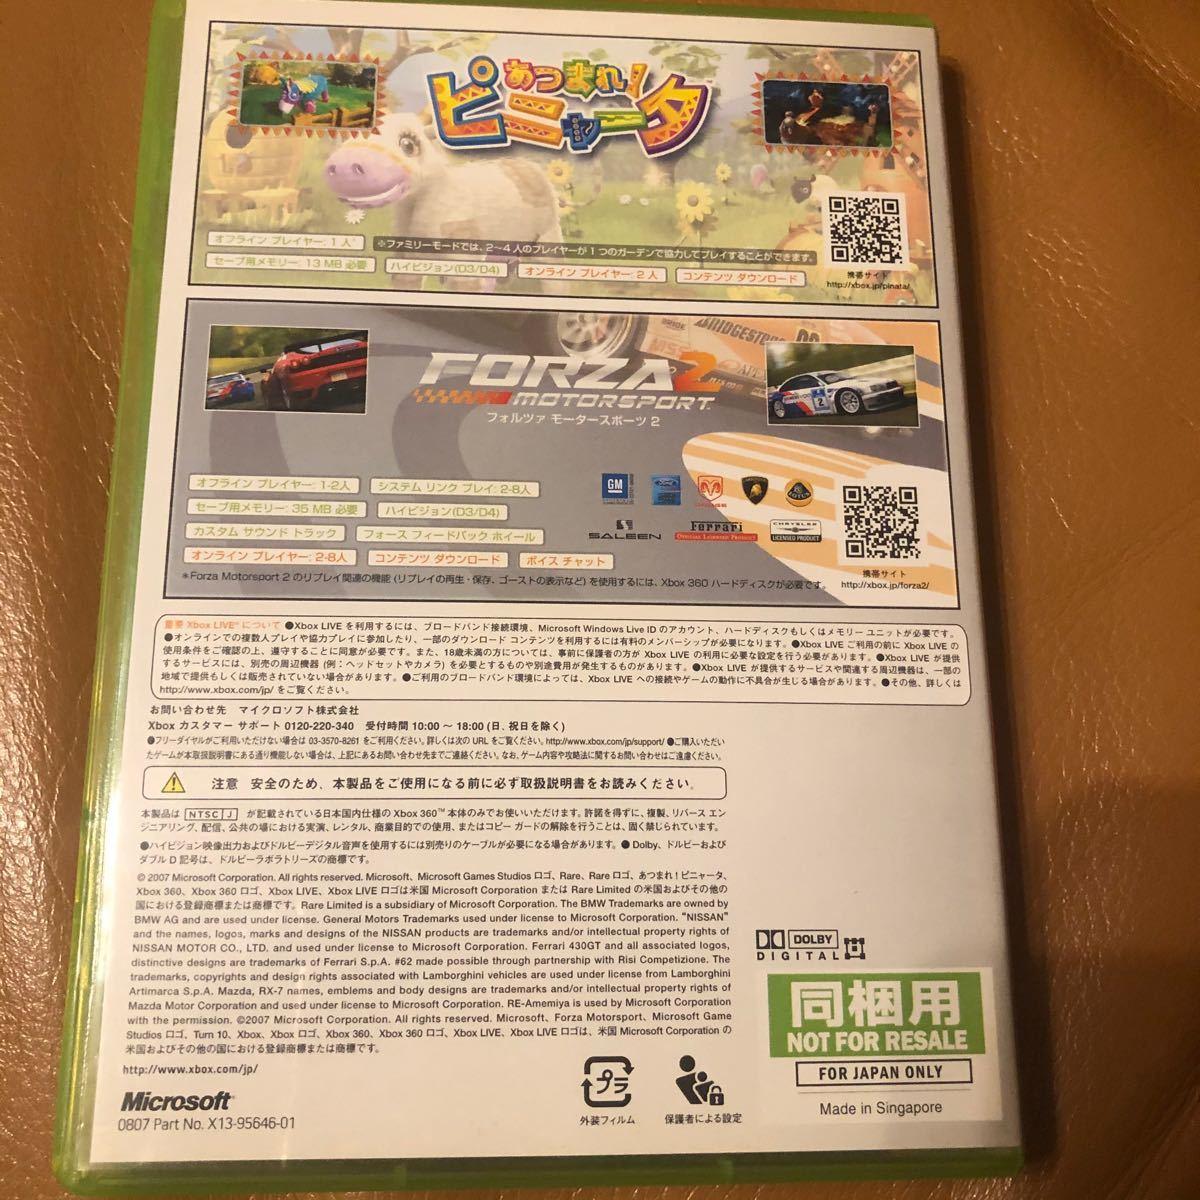 Xbox360用ソフト FORZA2&あつまれ!ピニャータ(同梱版)